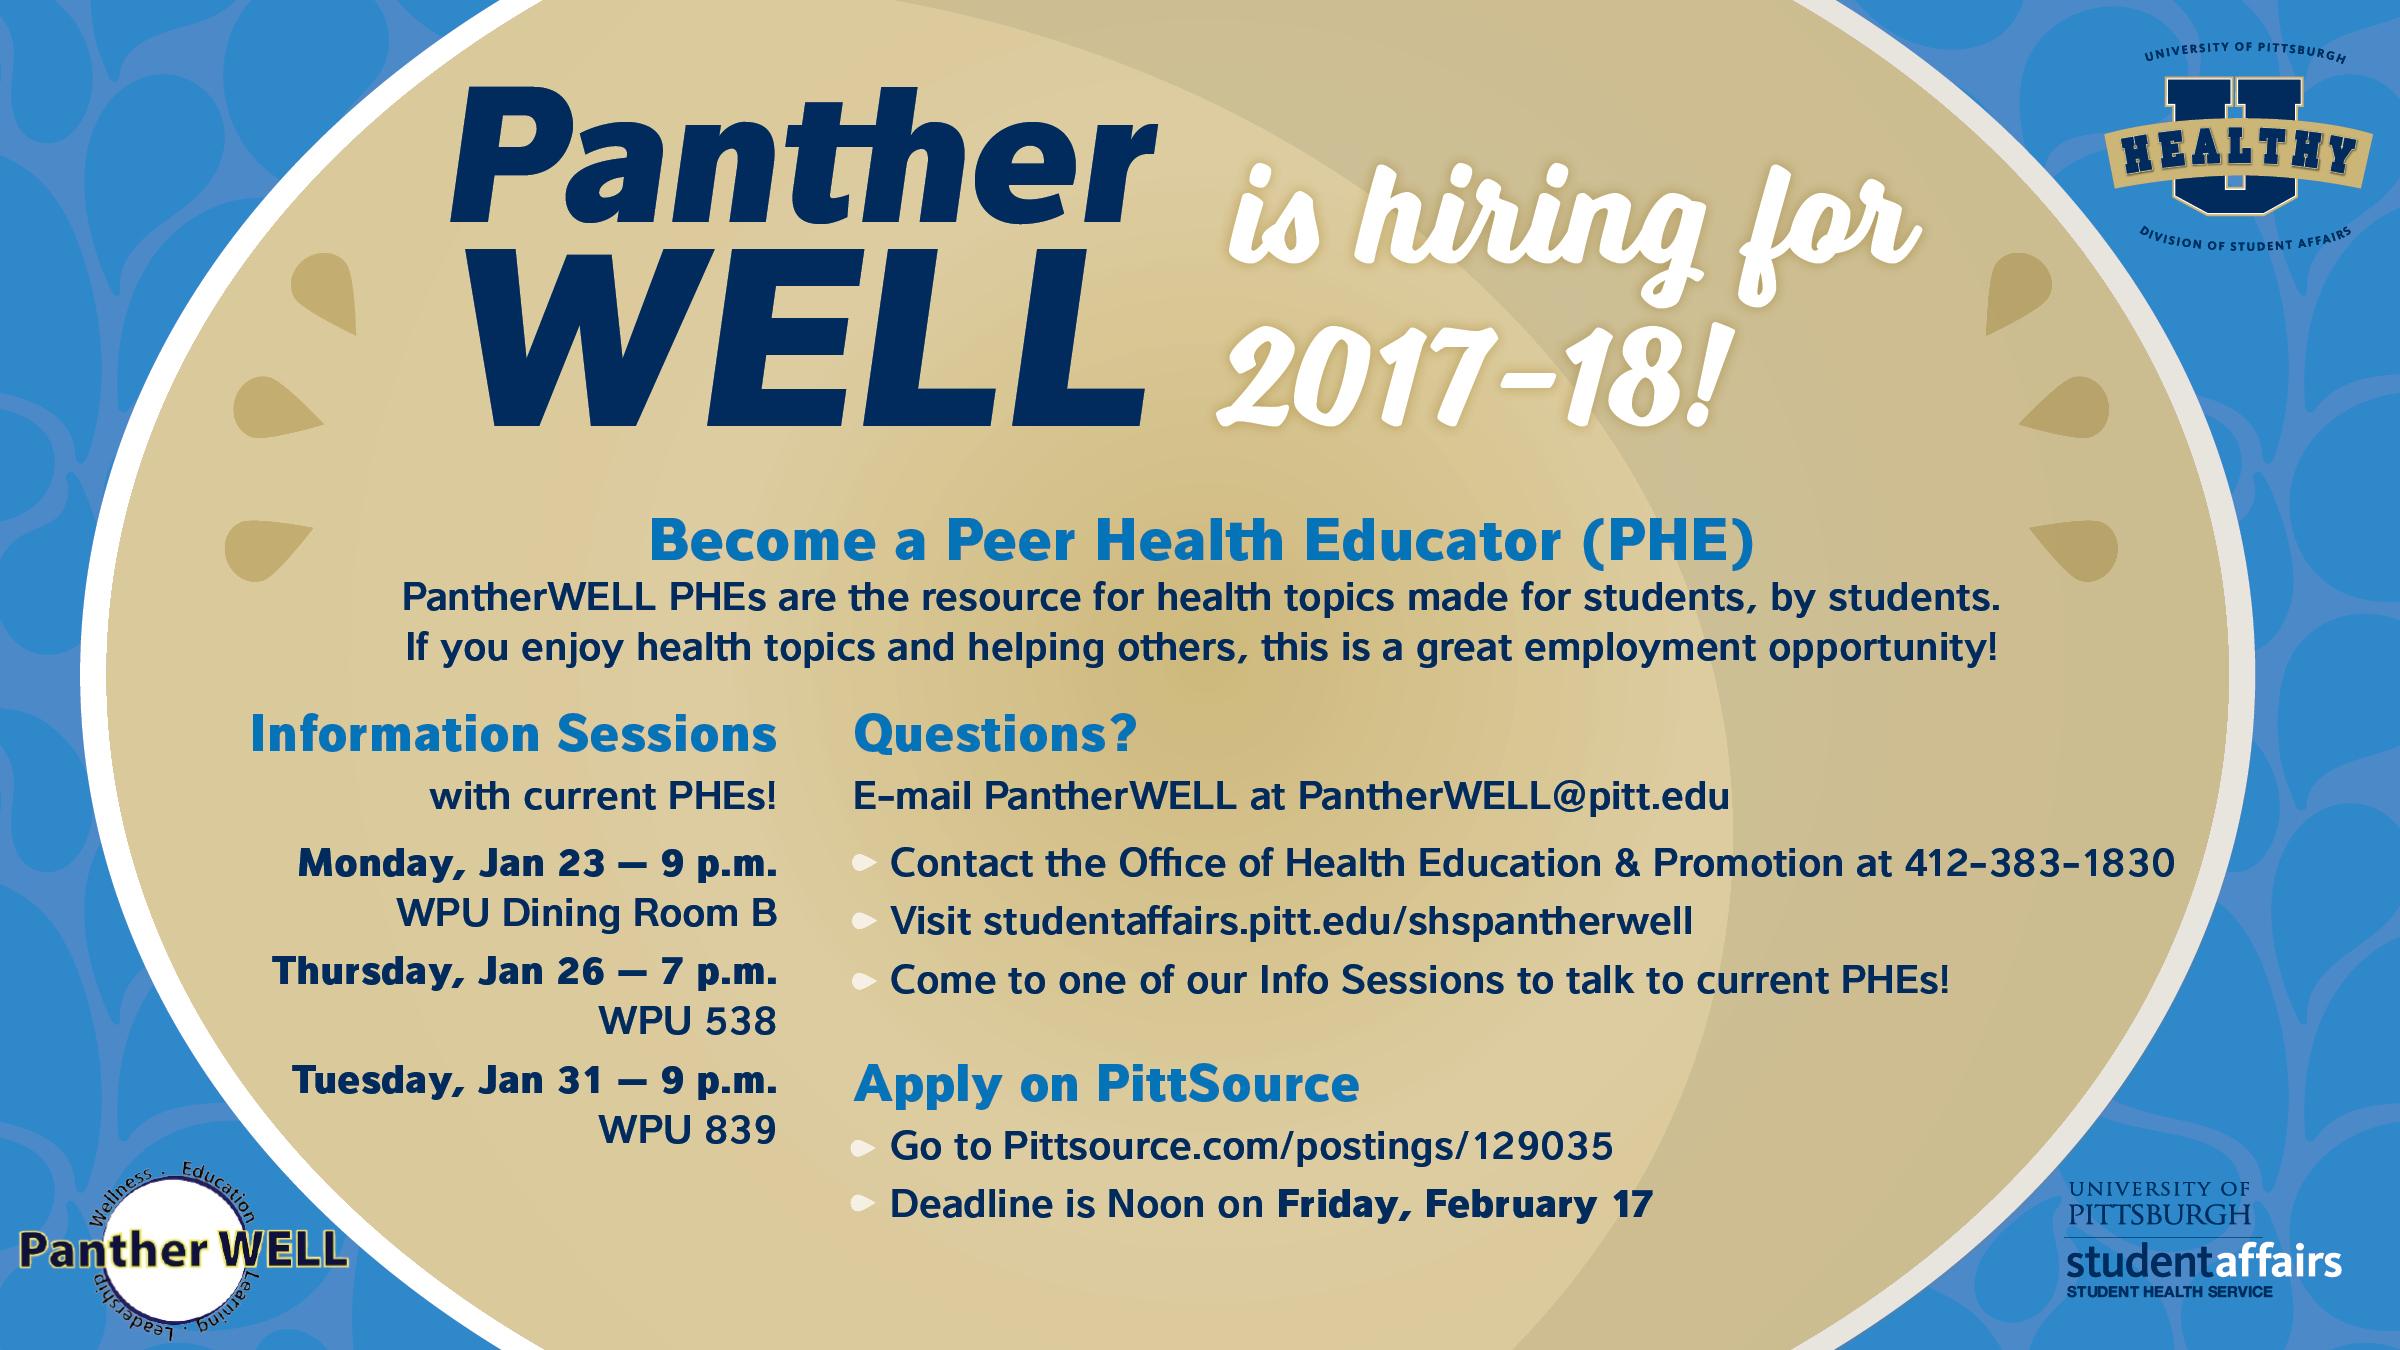 SHS_PantherWellRecruitment2017_Slide_Feb17